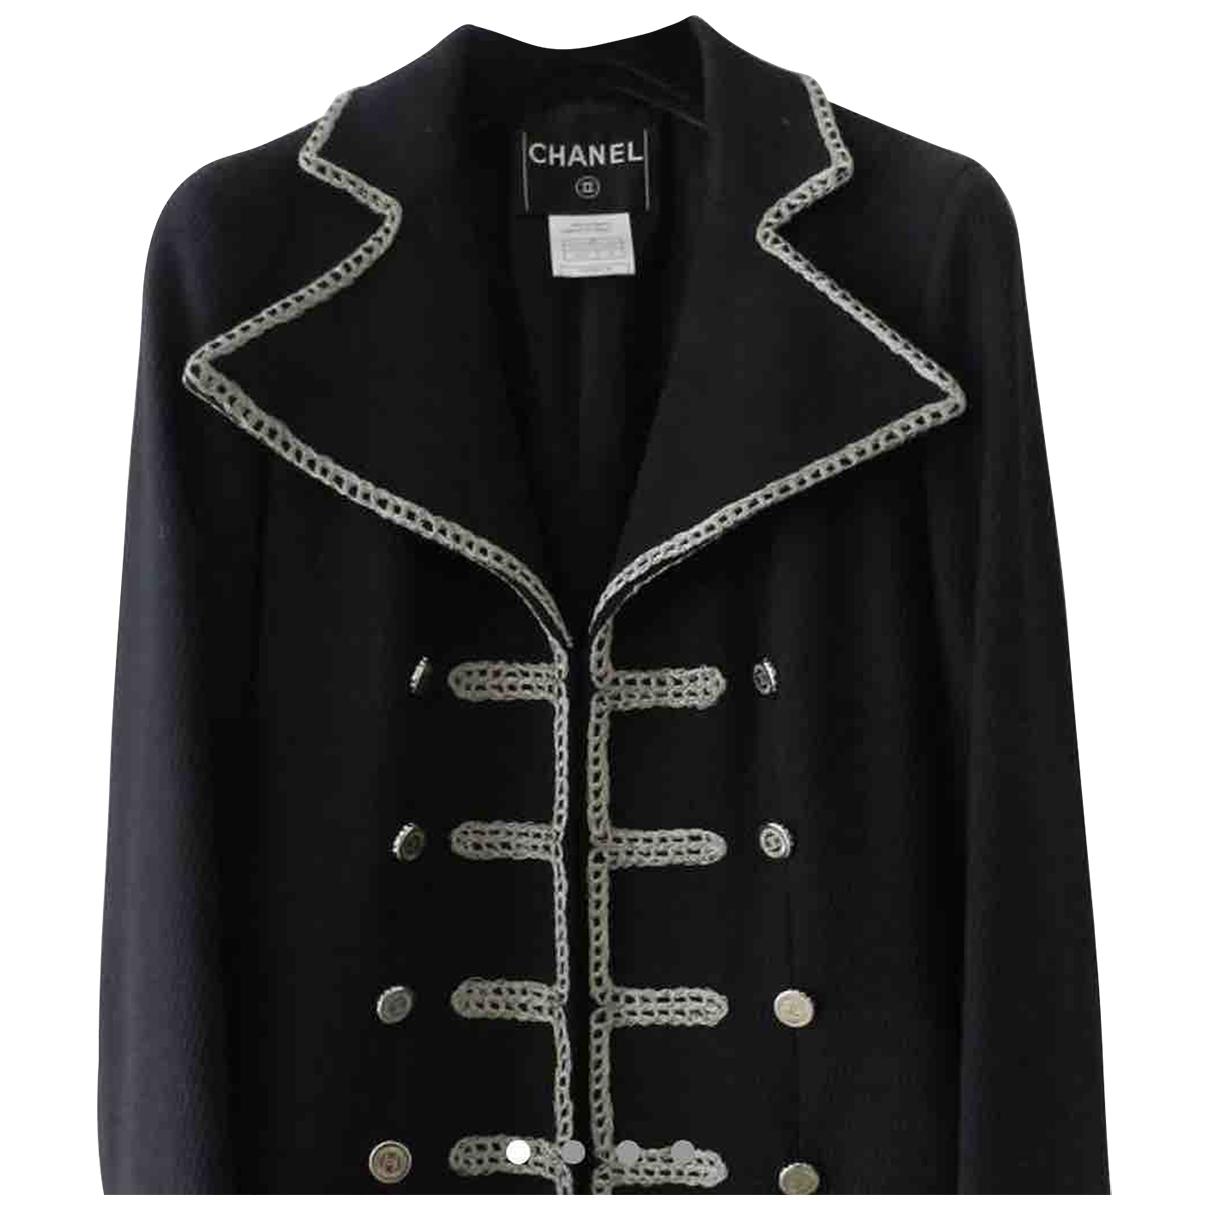 Chanel \N Black Cotton jacket for Women 8 UK